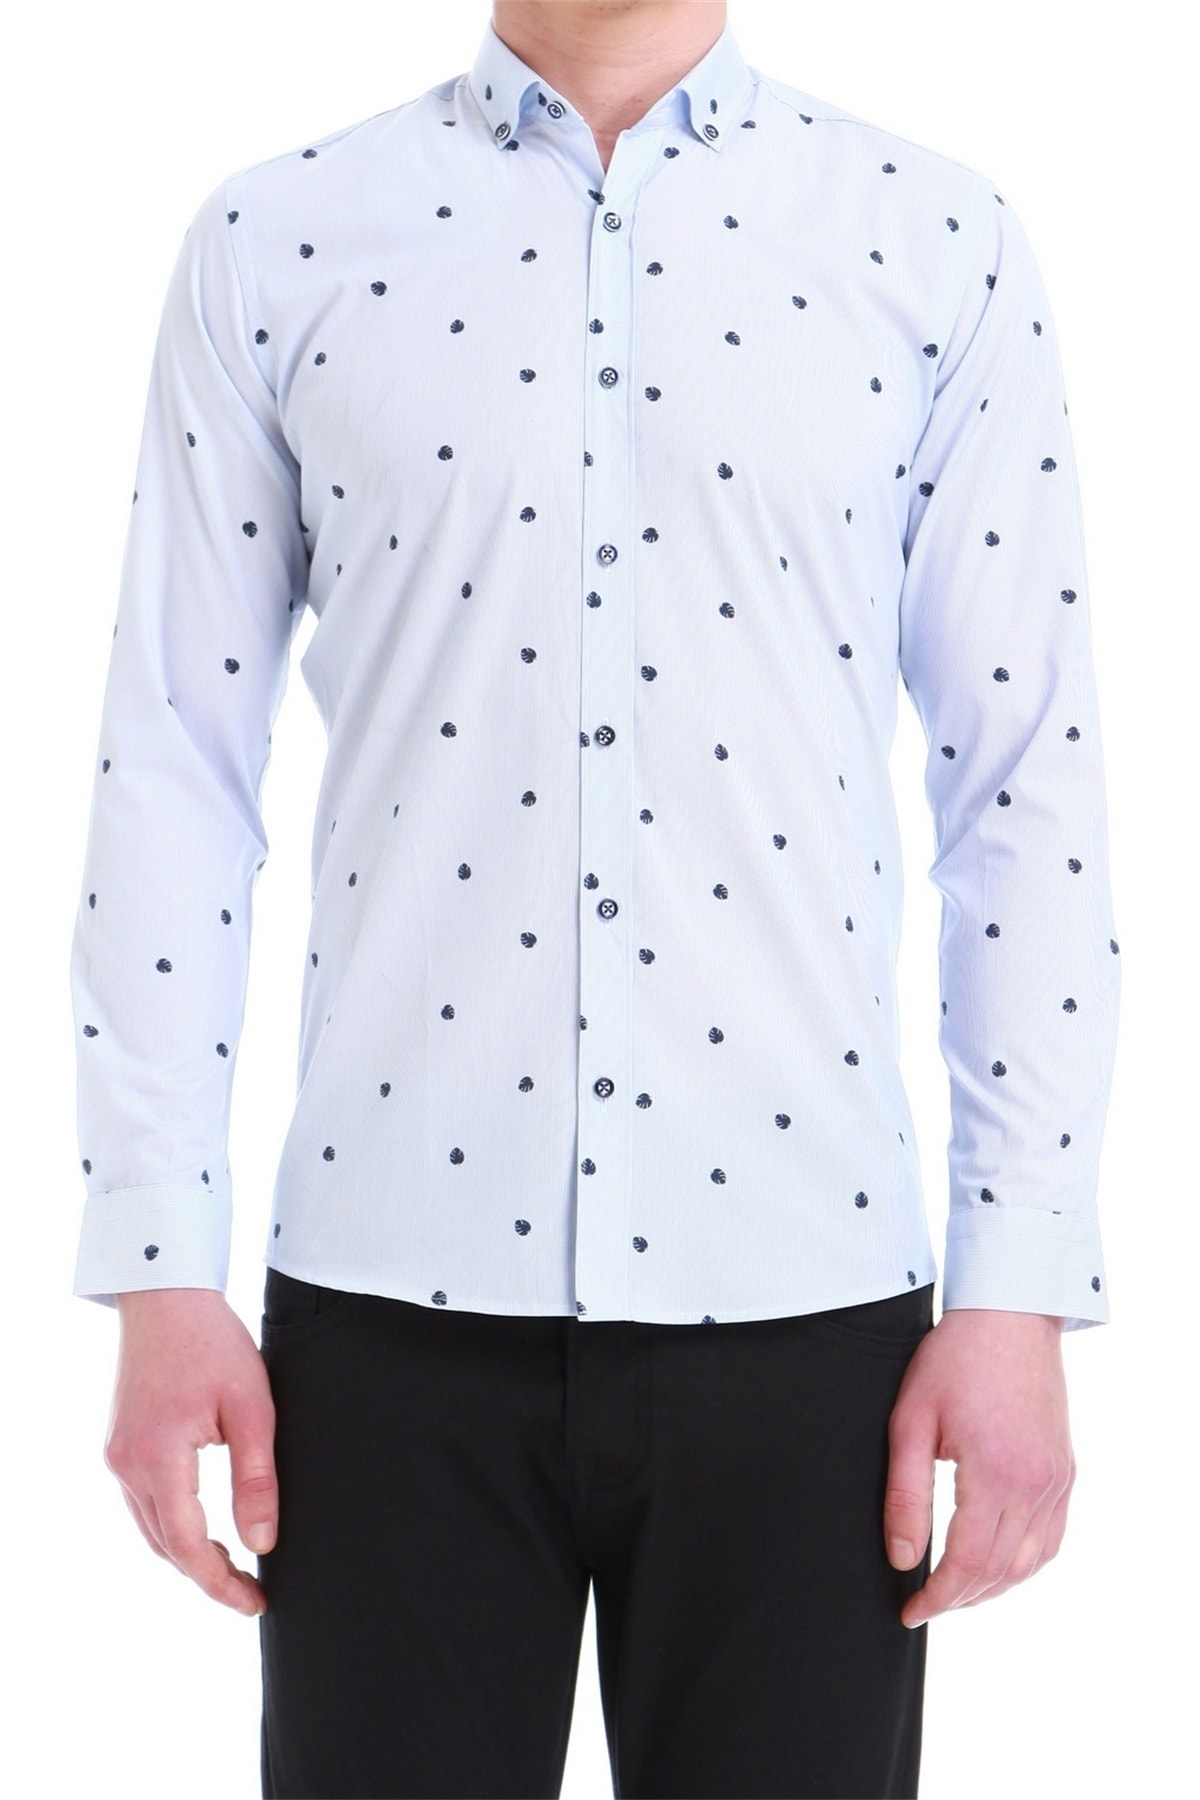 Efor Erkek Mavi Slim Fit Klasik Gömlek Gk 550 1